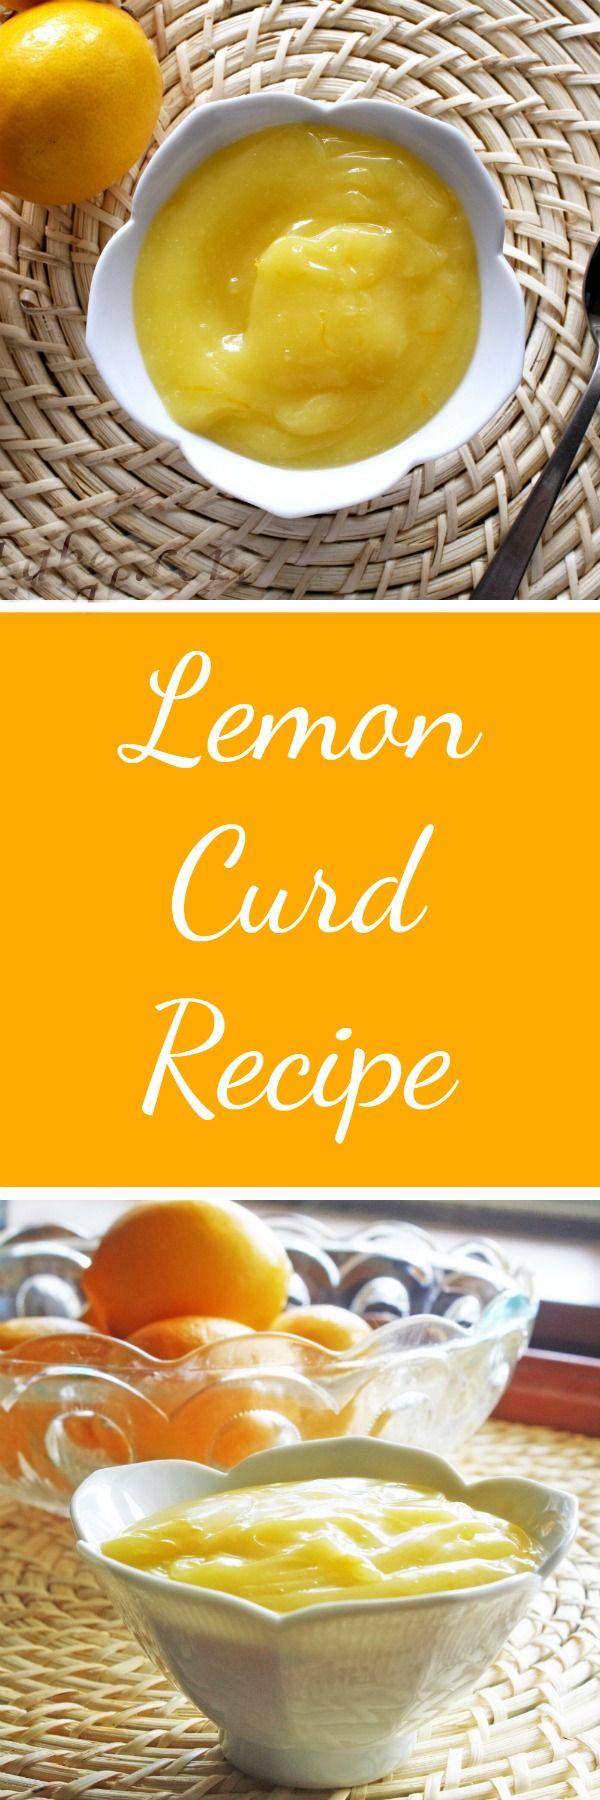 Lemon Curd Recipe RoseBakes.com